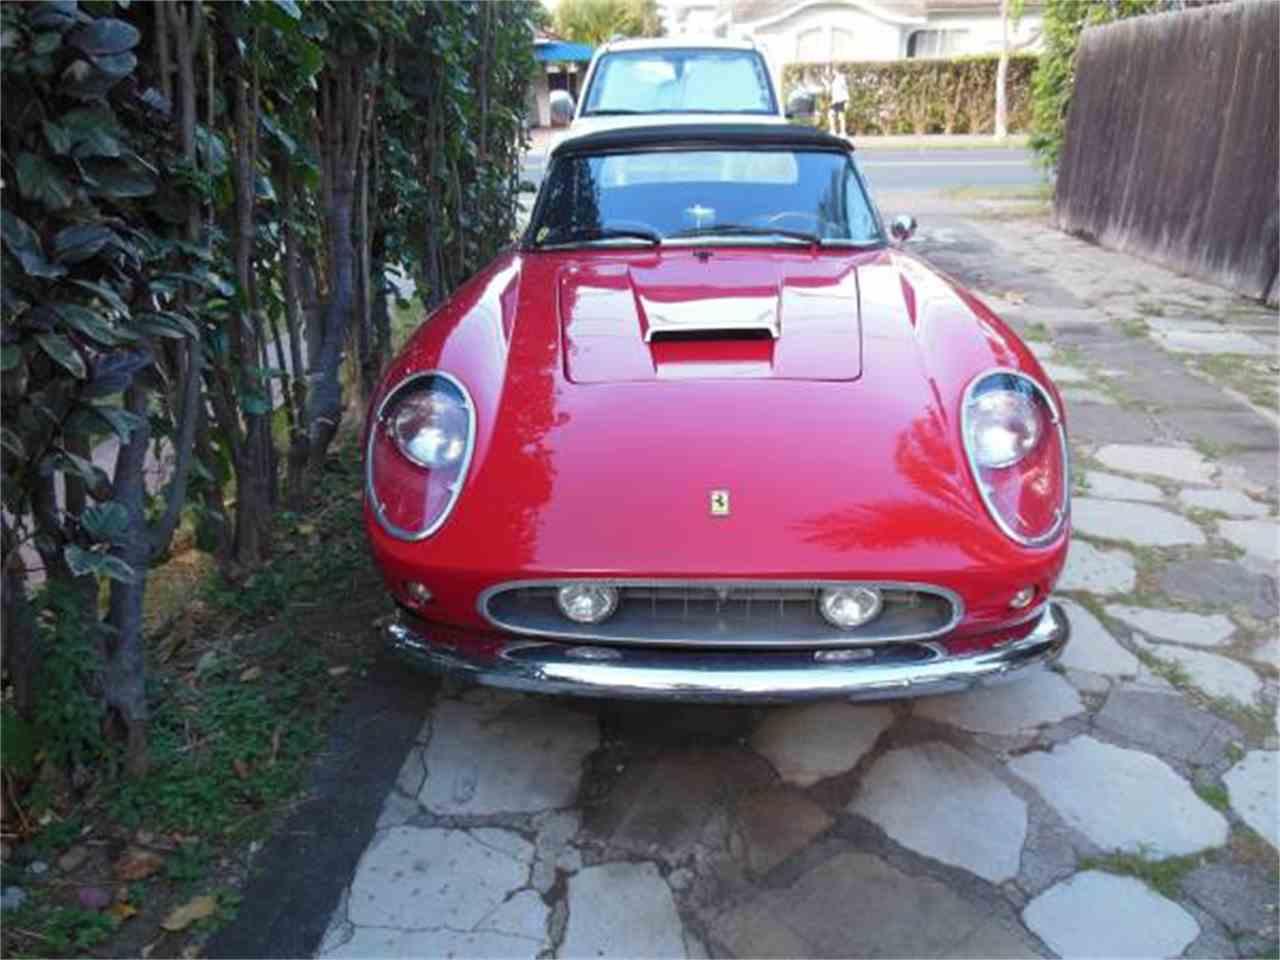 Craigslist Hawaii Oahu Cars: 1960 Ferrari 250 California Spyder For Sale